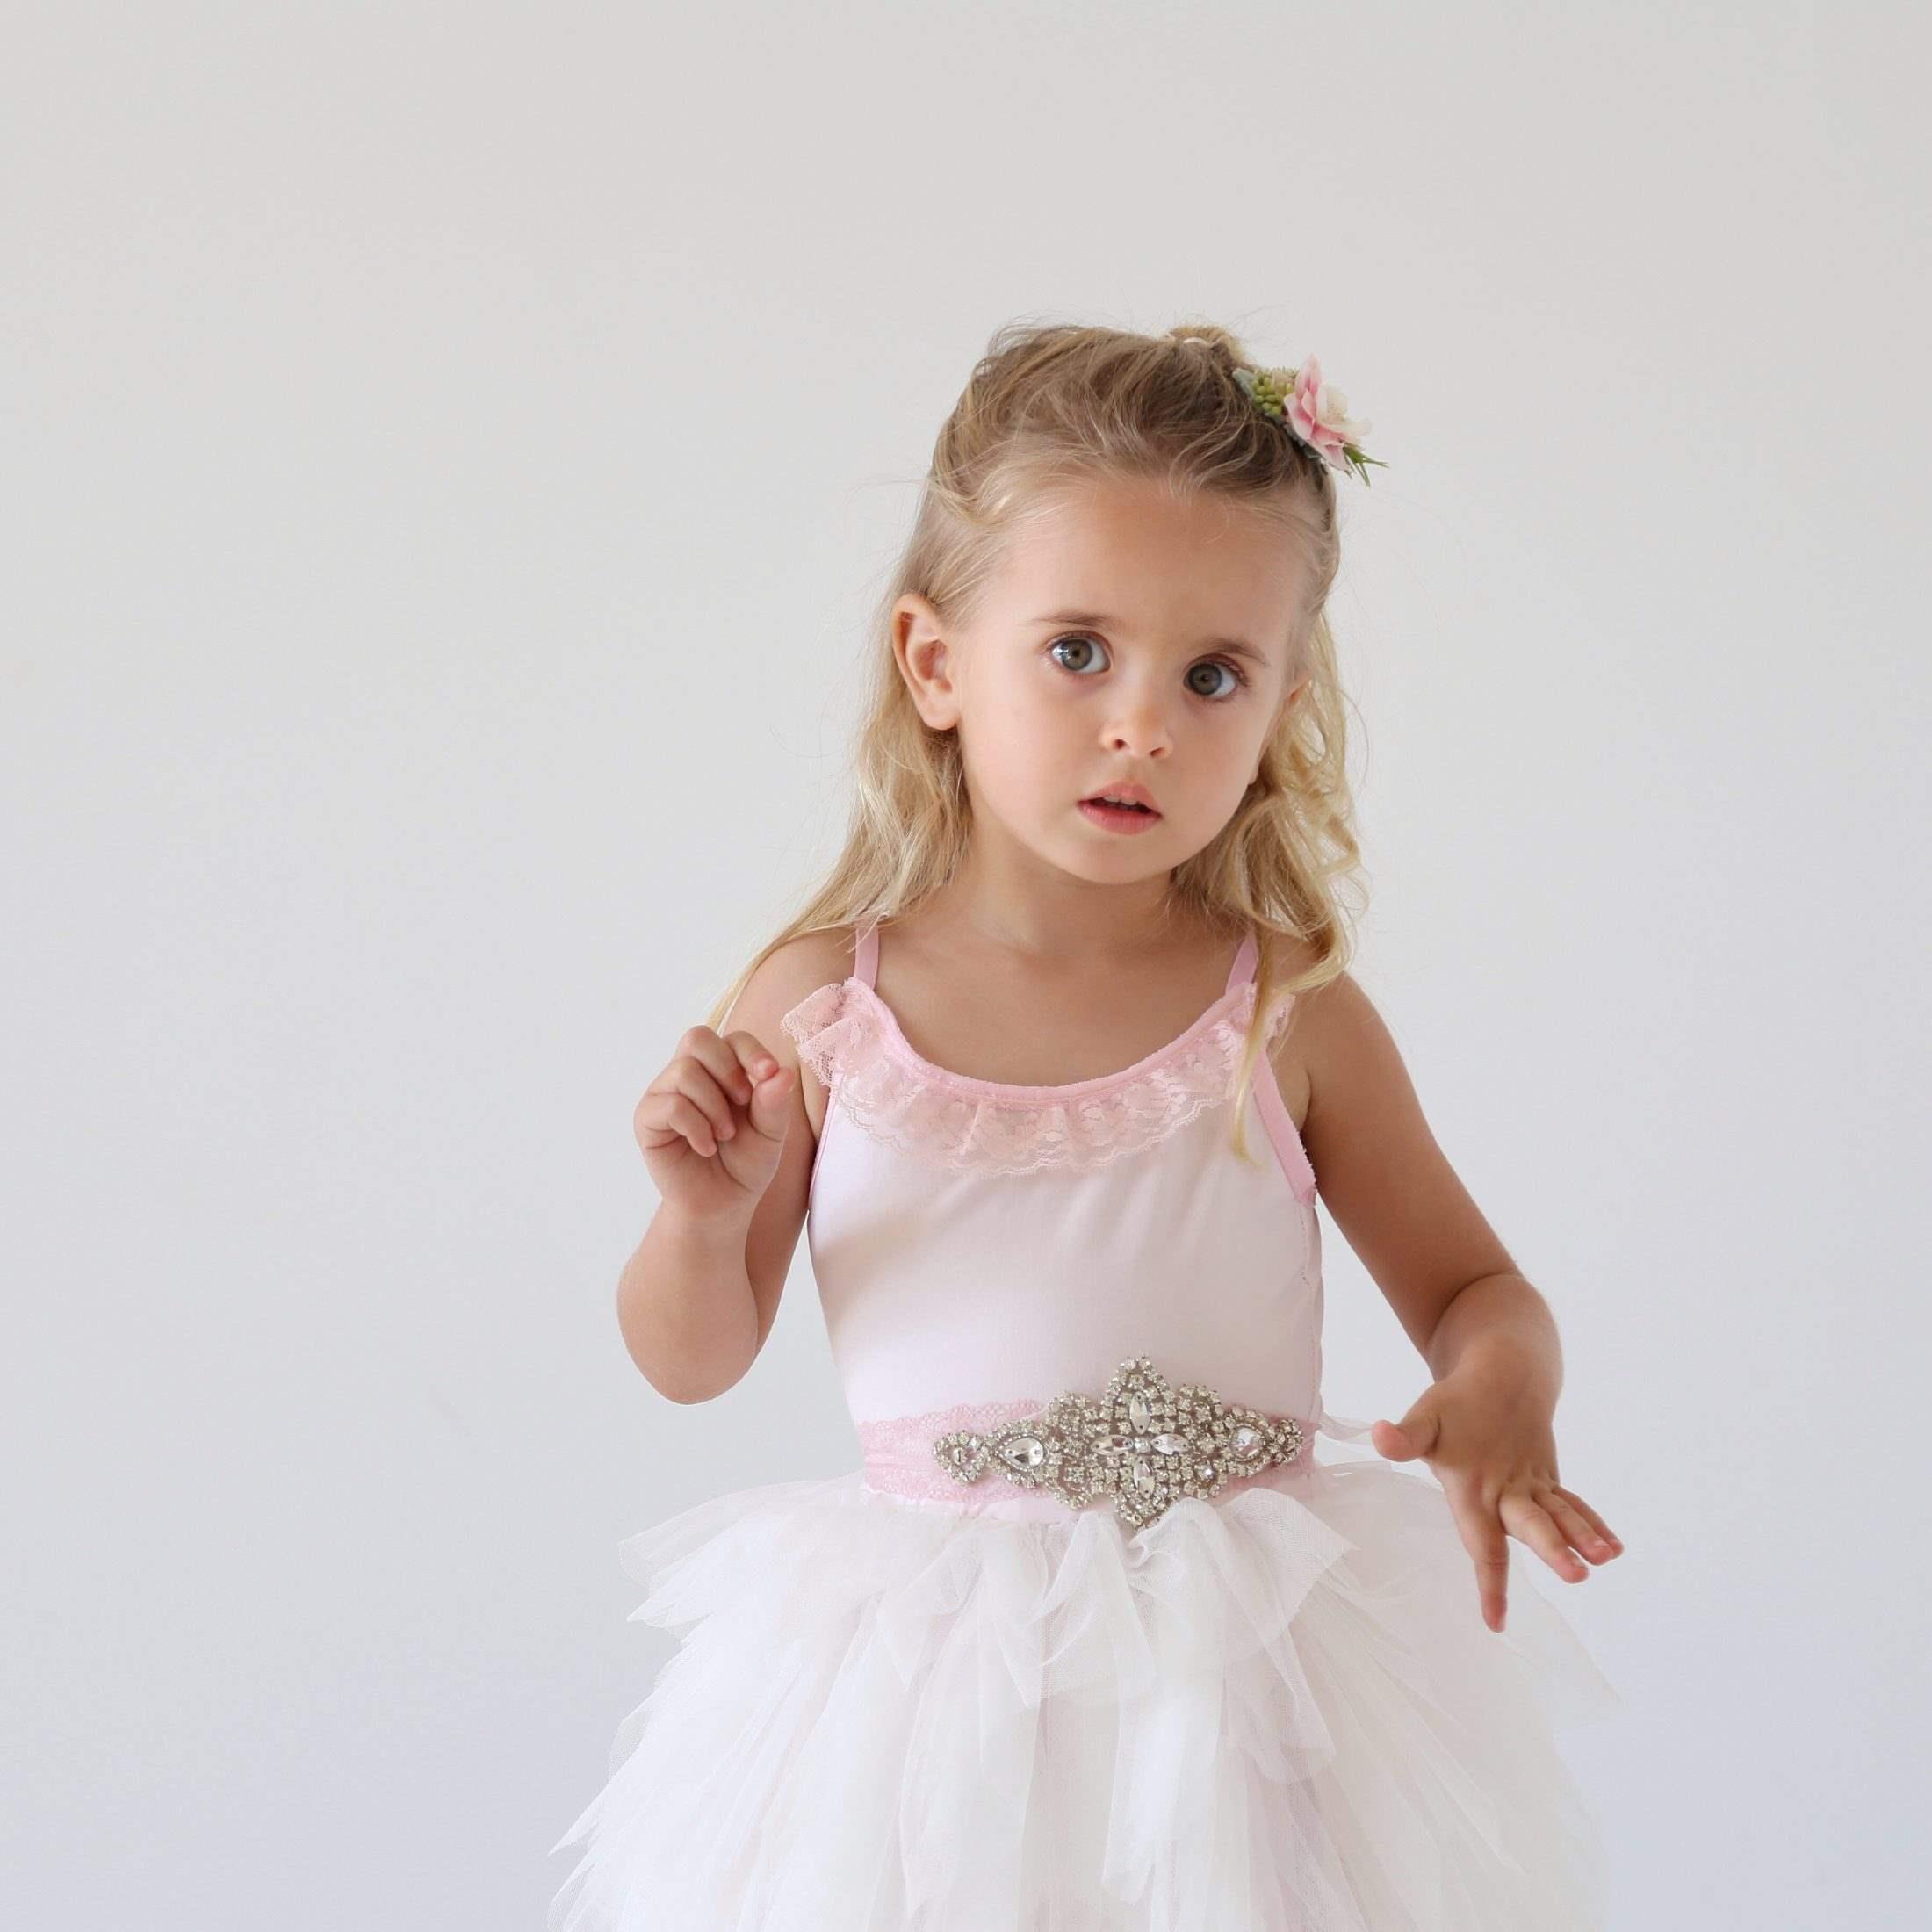 b5ba1b9d731f Sparkle Ballerina Dress - Coco Blush Boutique - Where little girls ...